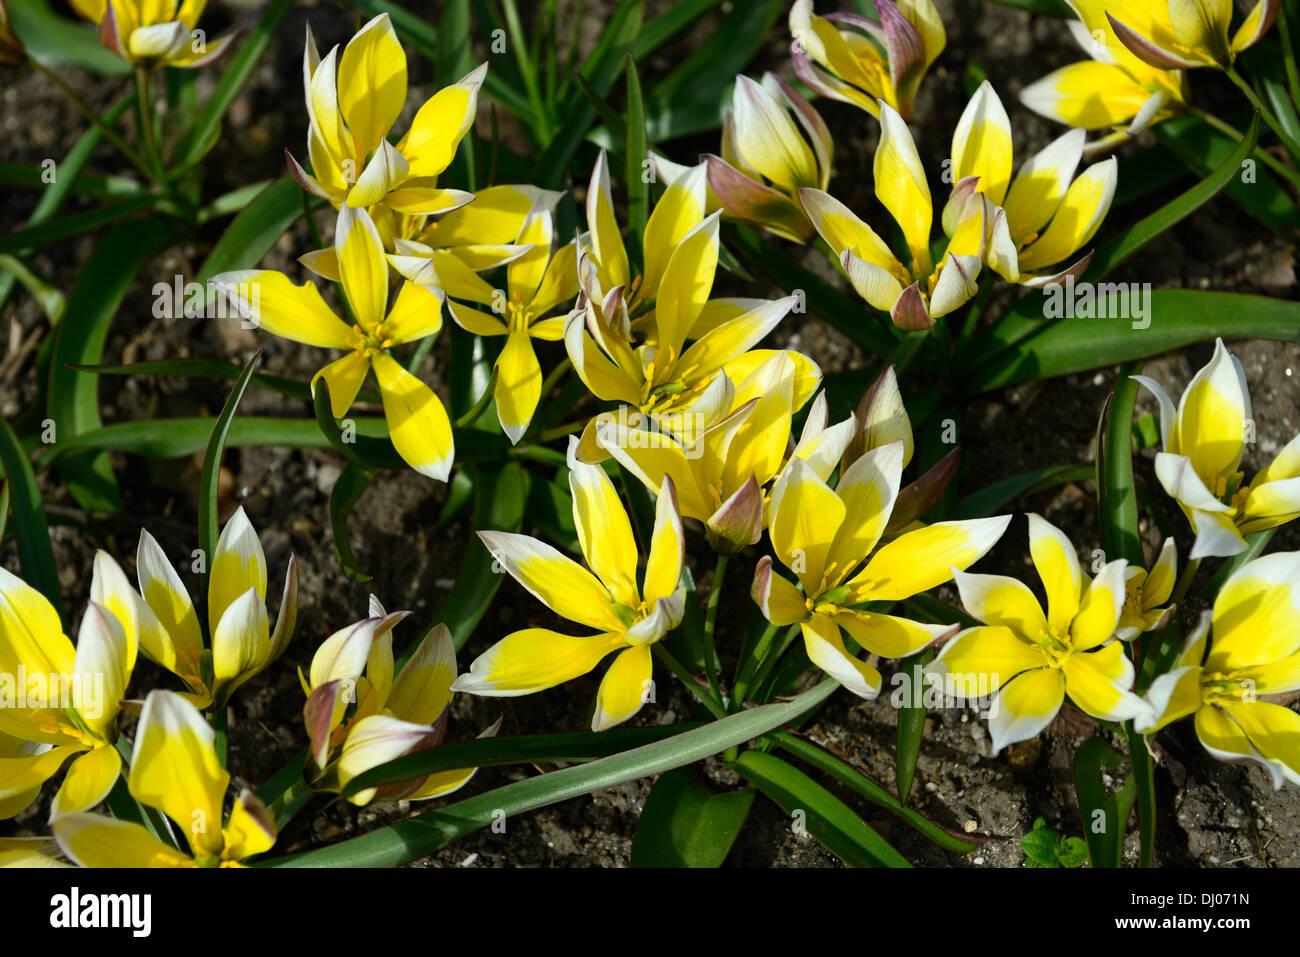 Tulipa Tarda Dasystemon Tulpe Arten Gelbe Zitrone Creme farbigen farbigen Farbe Farbe Blume Blüte Blüte Zwerg Klumpen bilden Stockbild